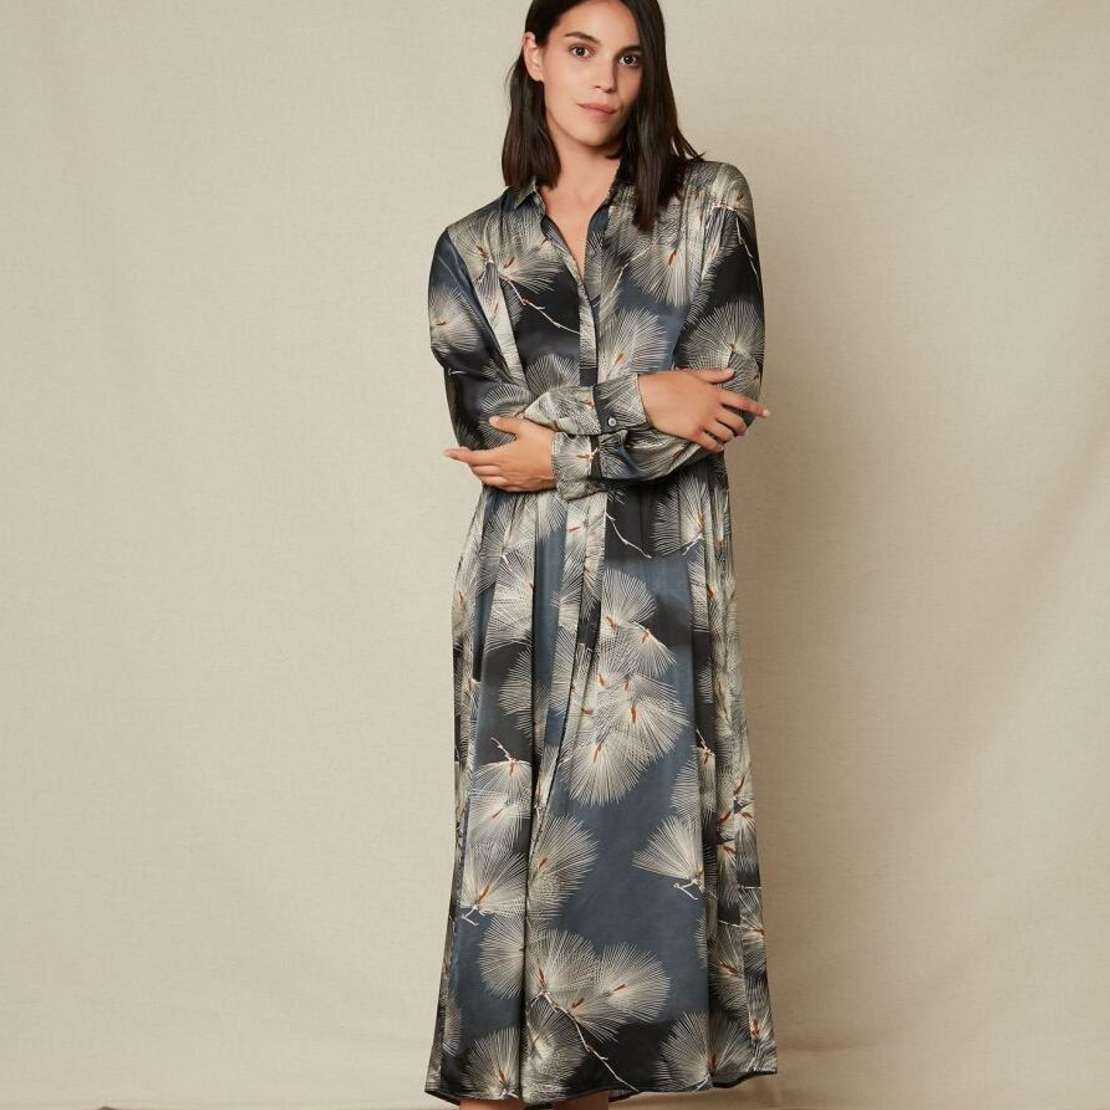 Top 10 Sales picks - The printed dress by Hartford